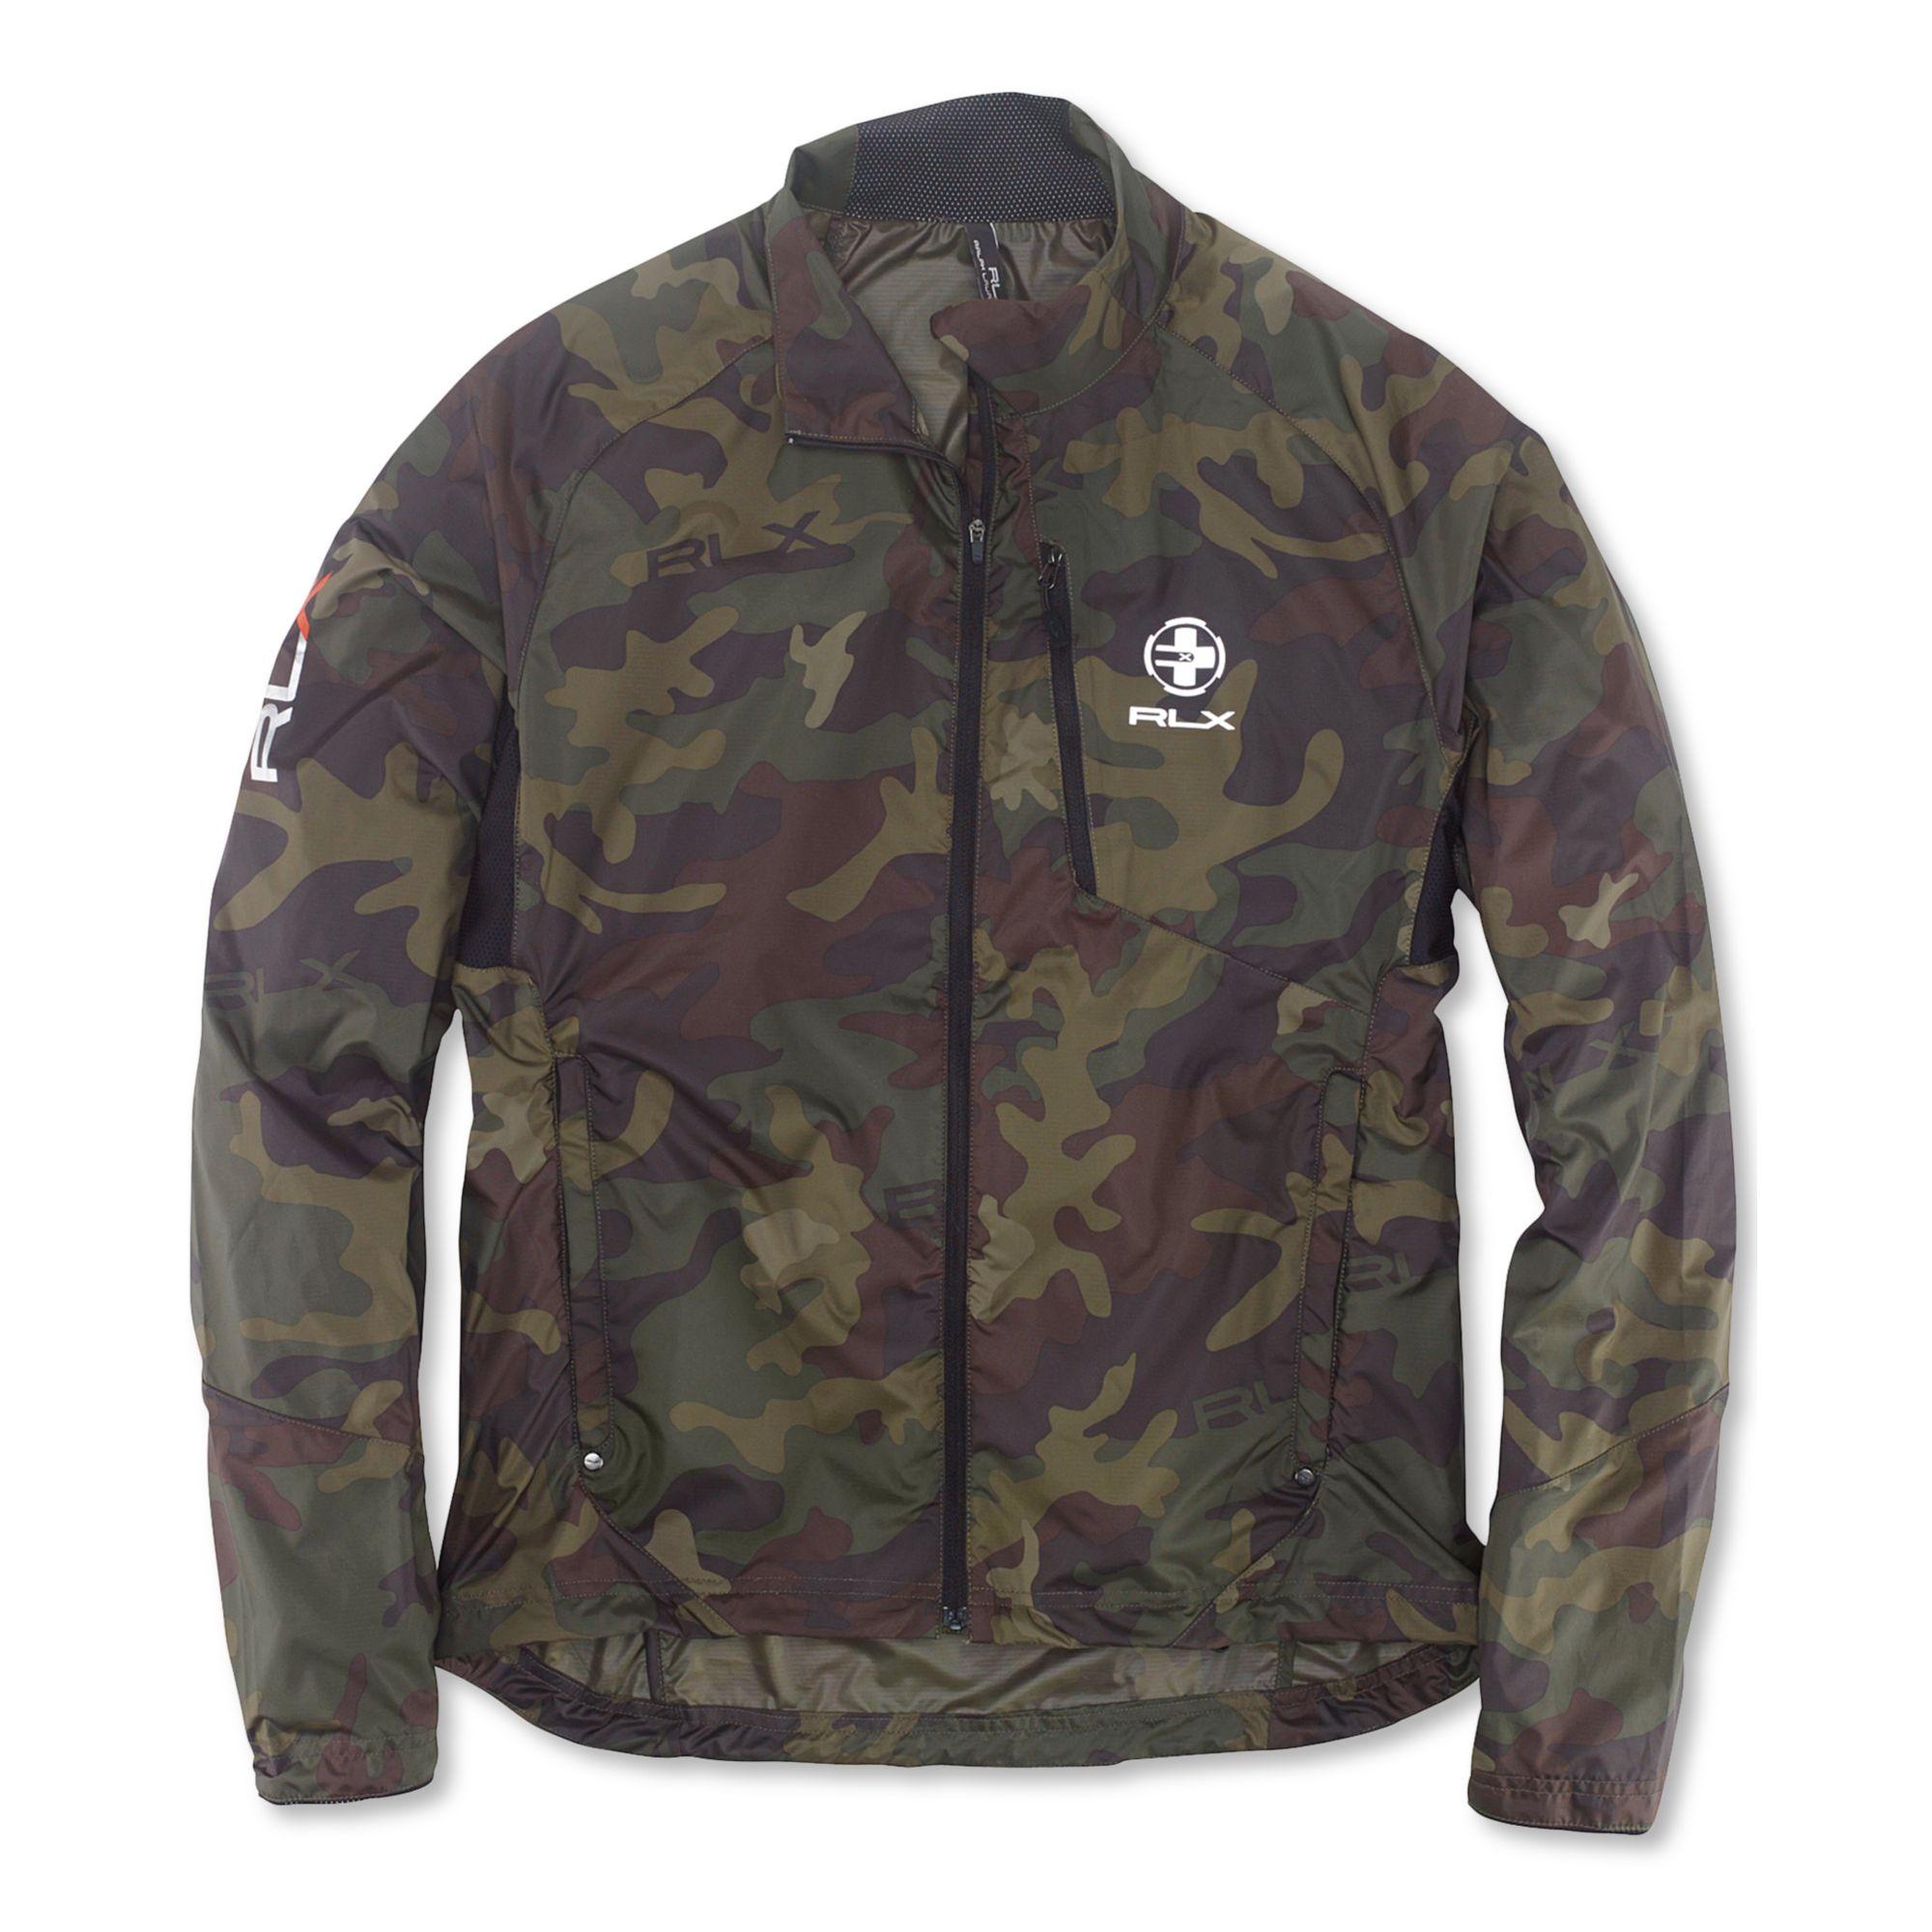 Ralph Lauren Polo Rlx Packable Trailwind Camouflage Jacket ...